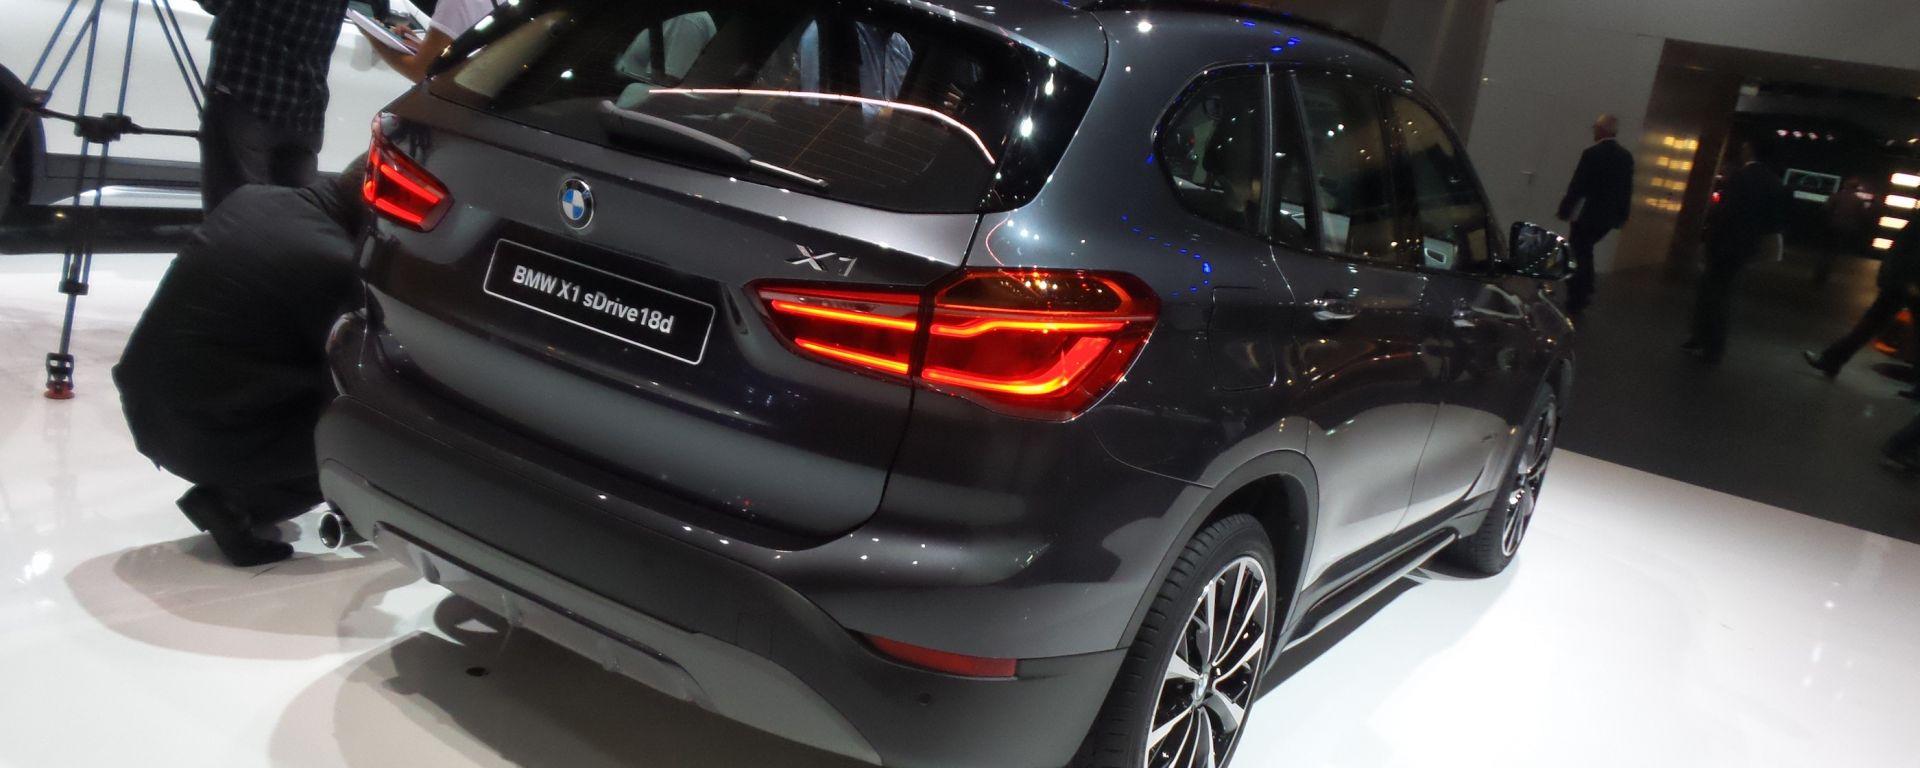 BMW X1 2015: foto LIVE e info